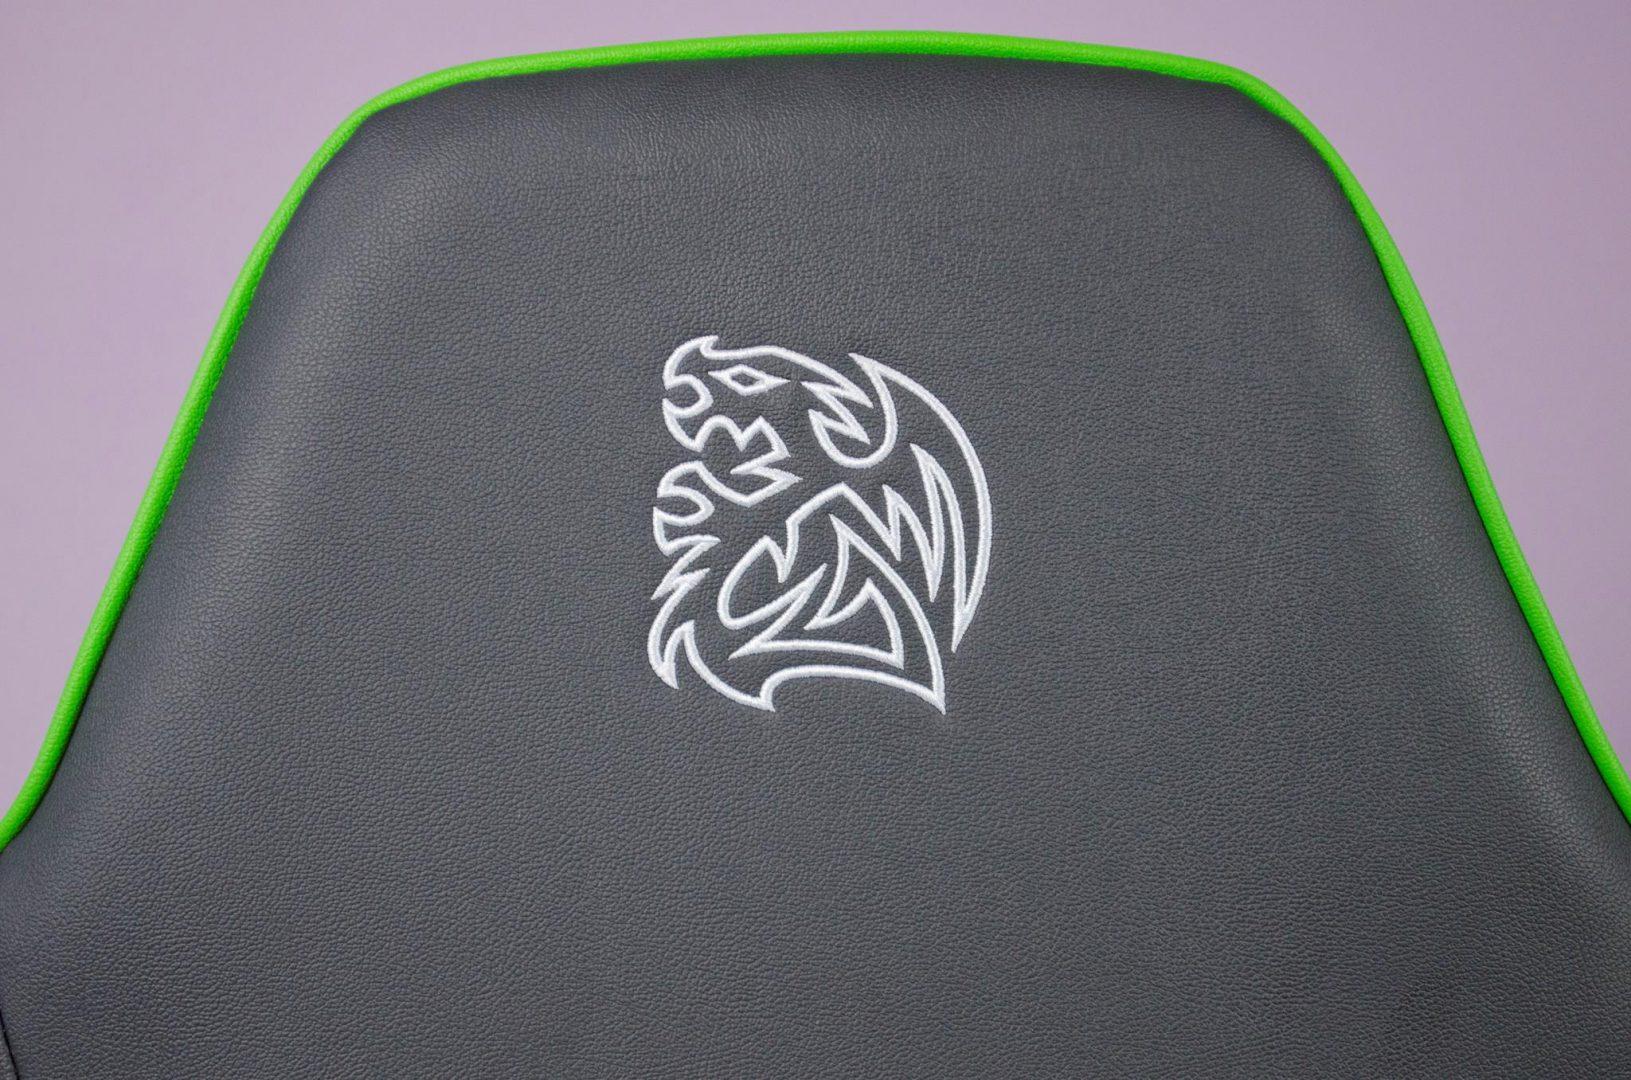 tt esports gt comfort gaming chair_22